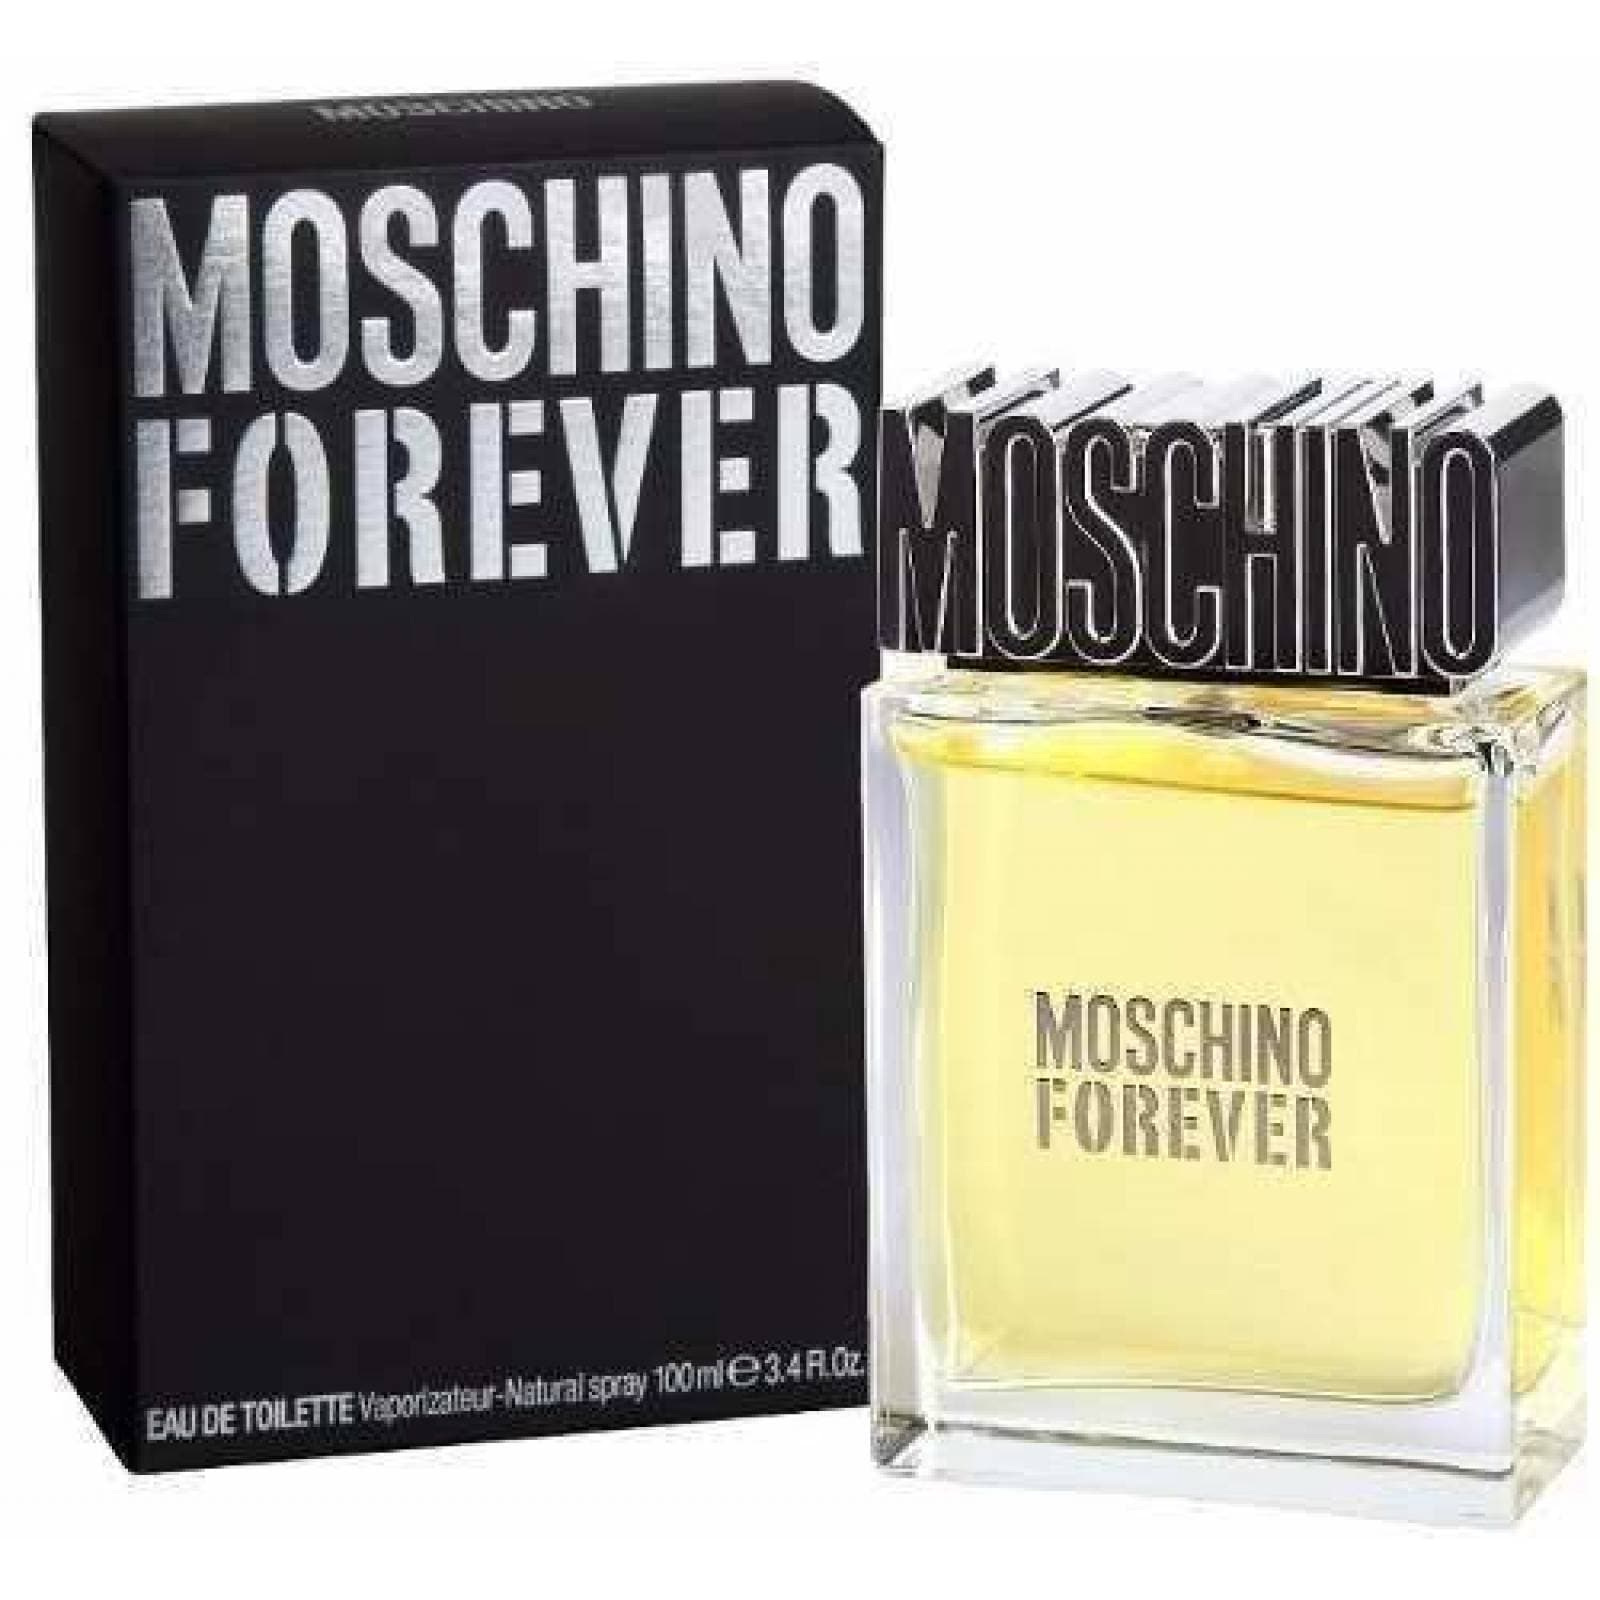 Moschino Forever Caballero 100 Ml Perfume Spray